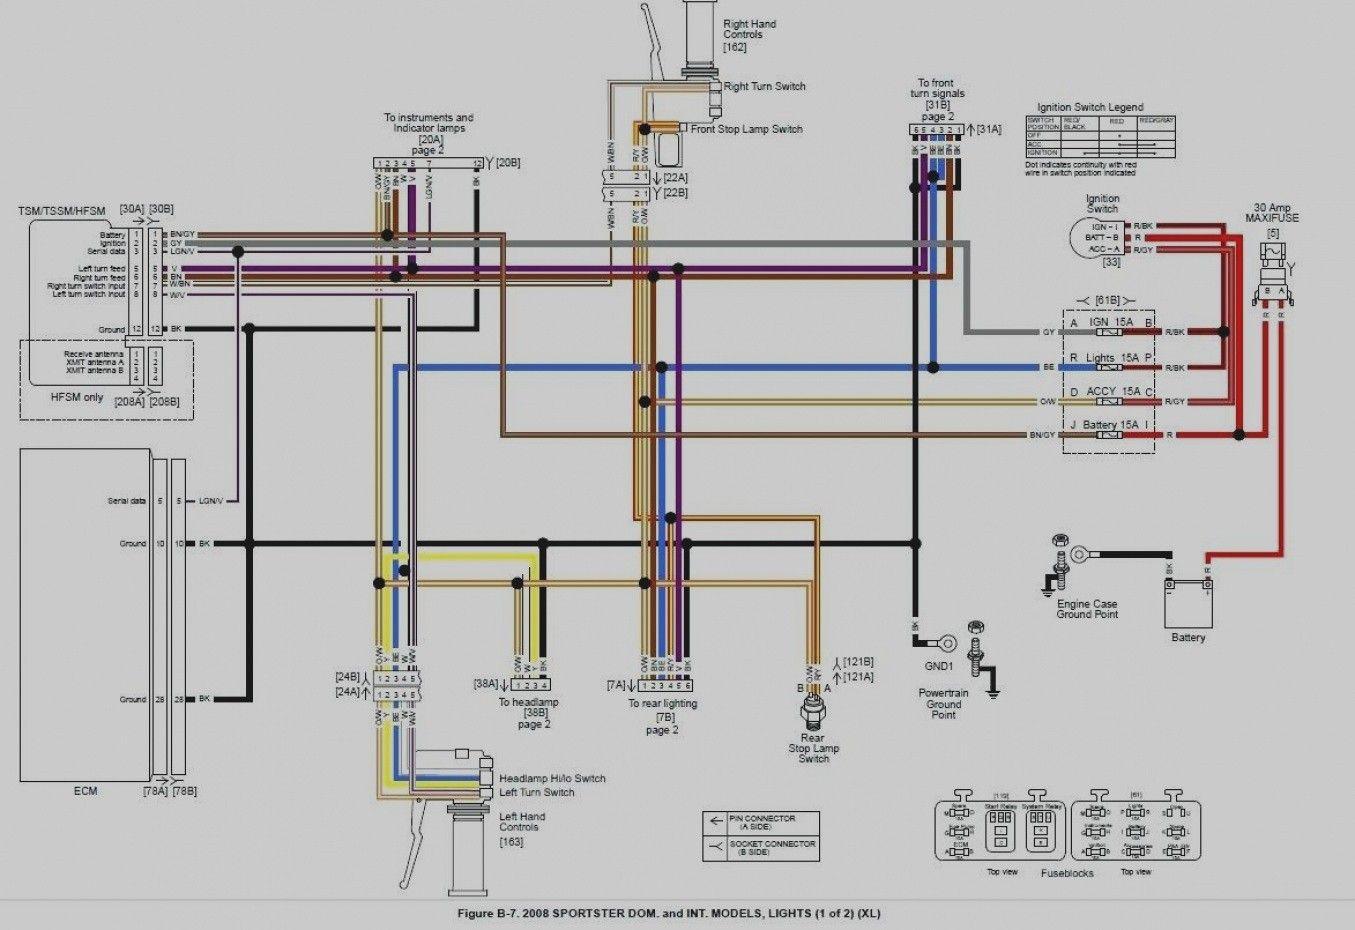 Harley Sportster Wiring Diagram In 2020 Home Electrical Wiring Sportster Diagram